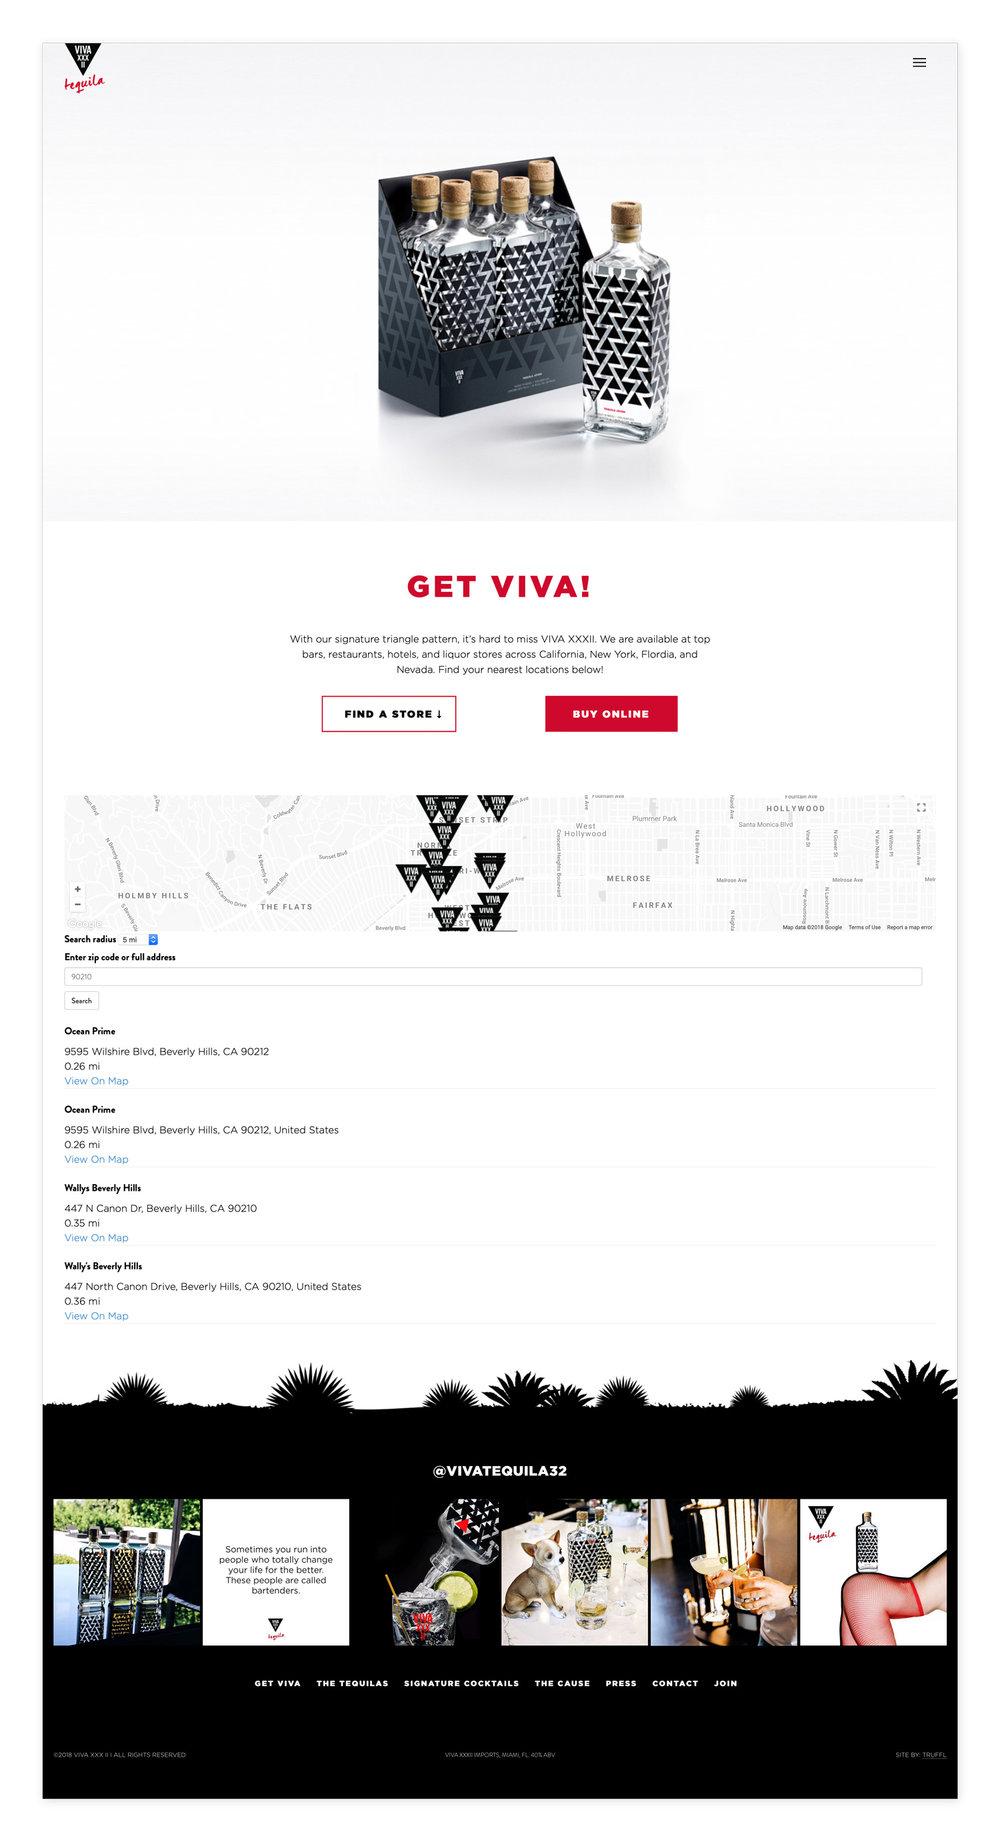 Get Viva -